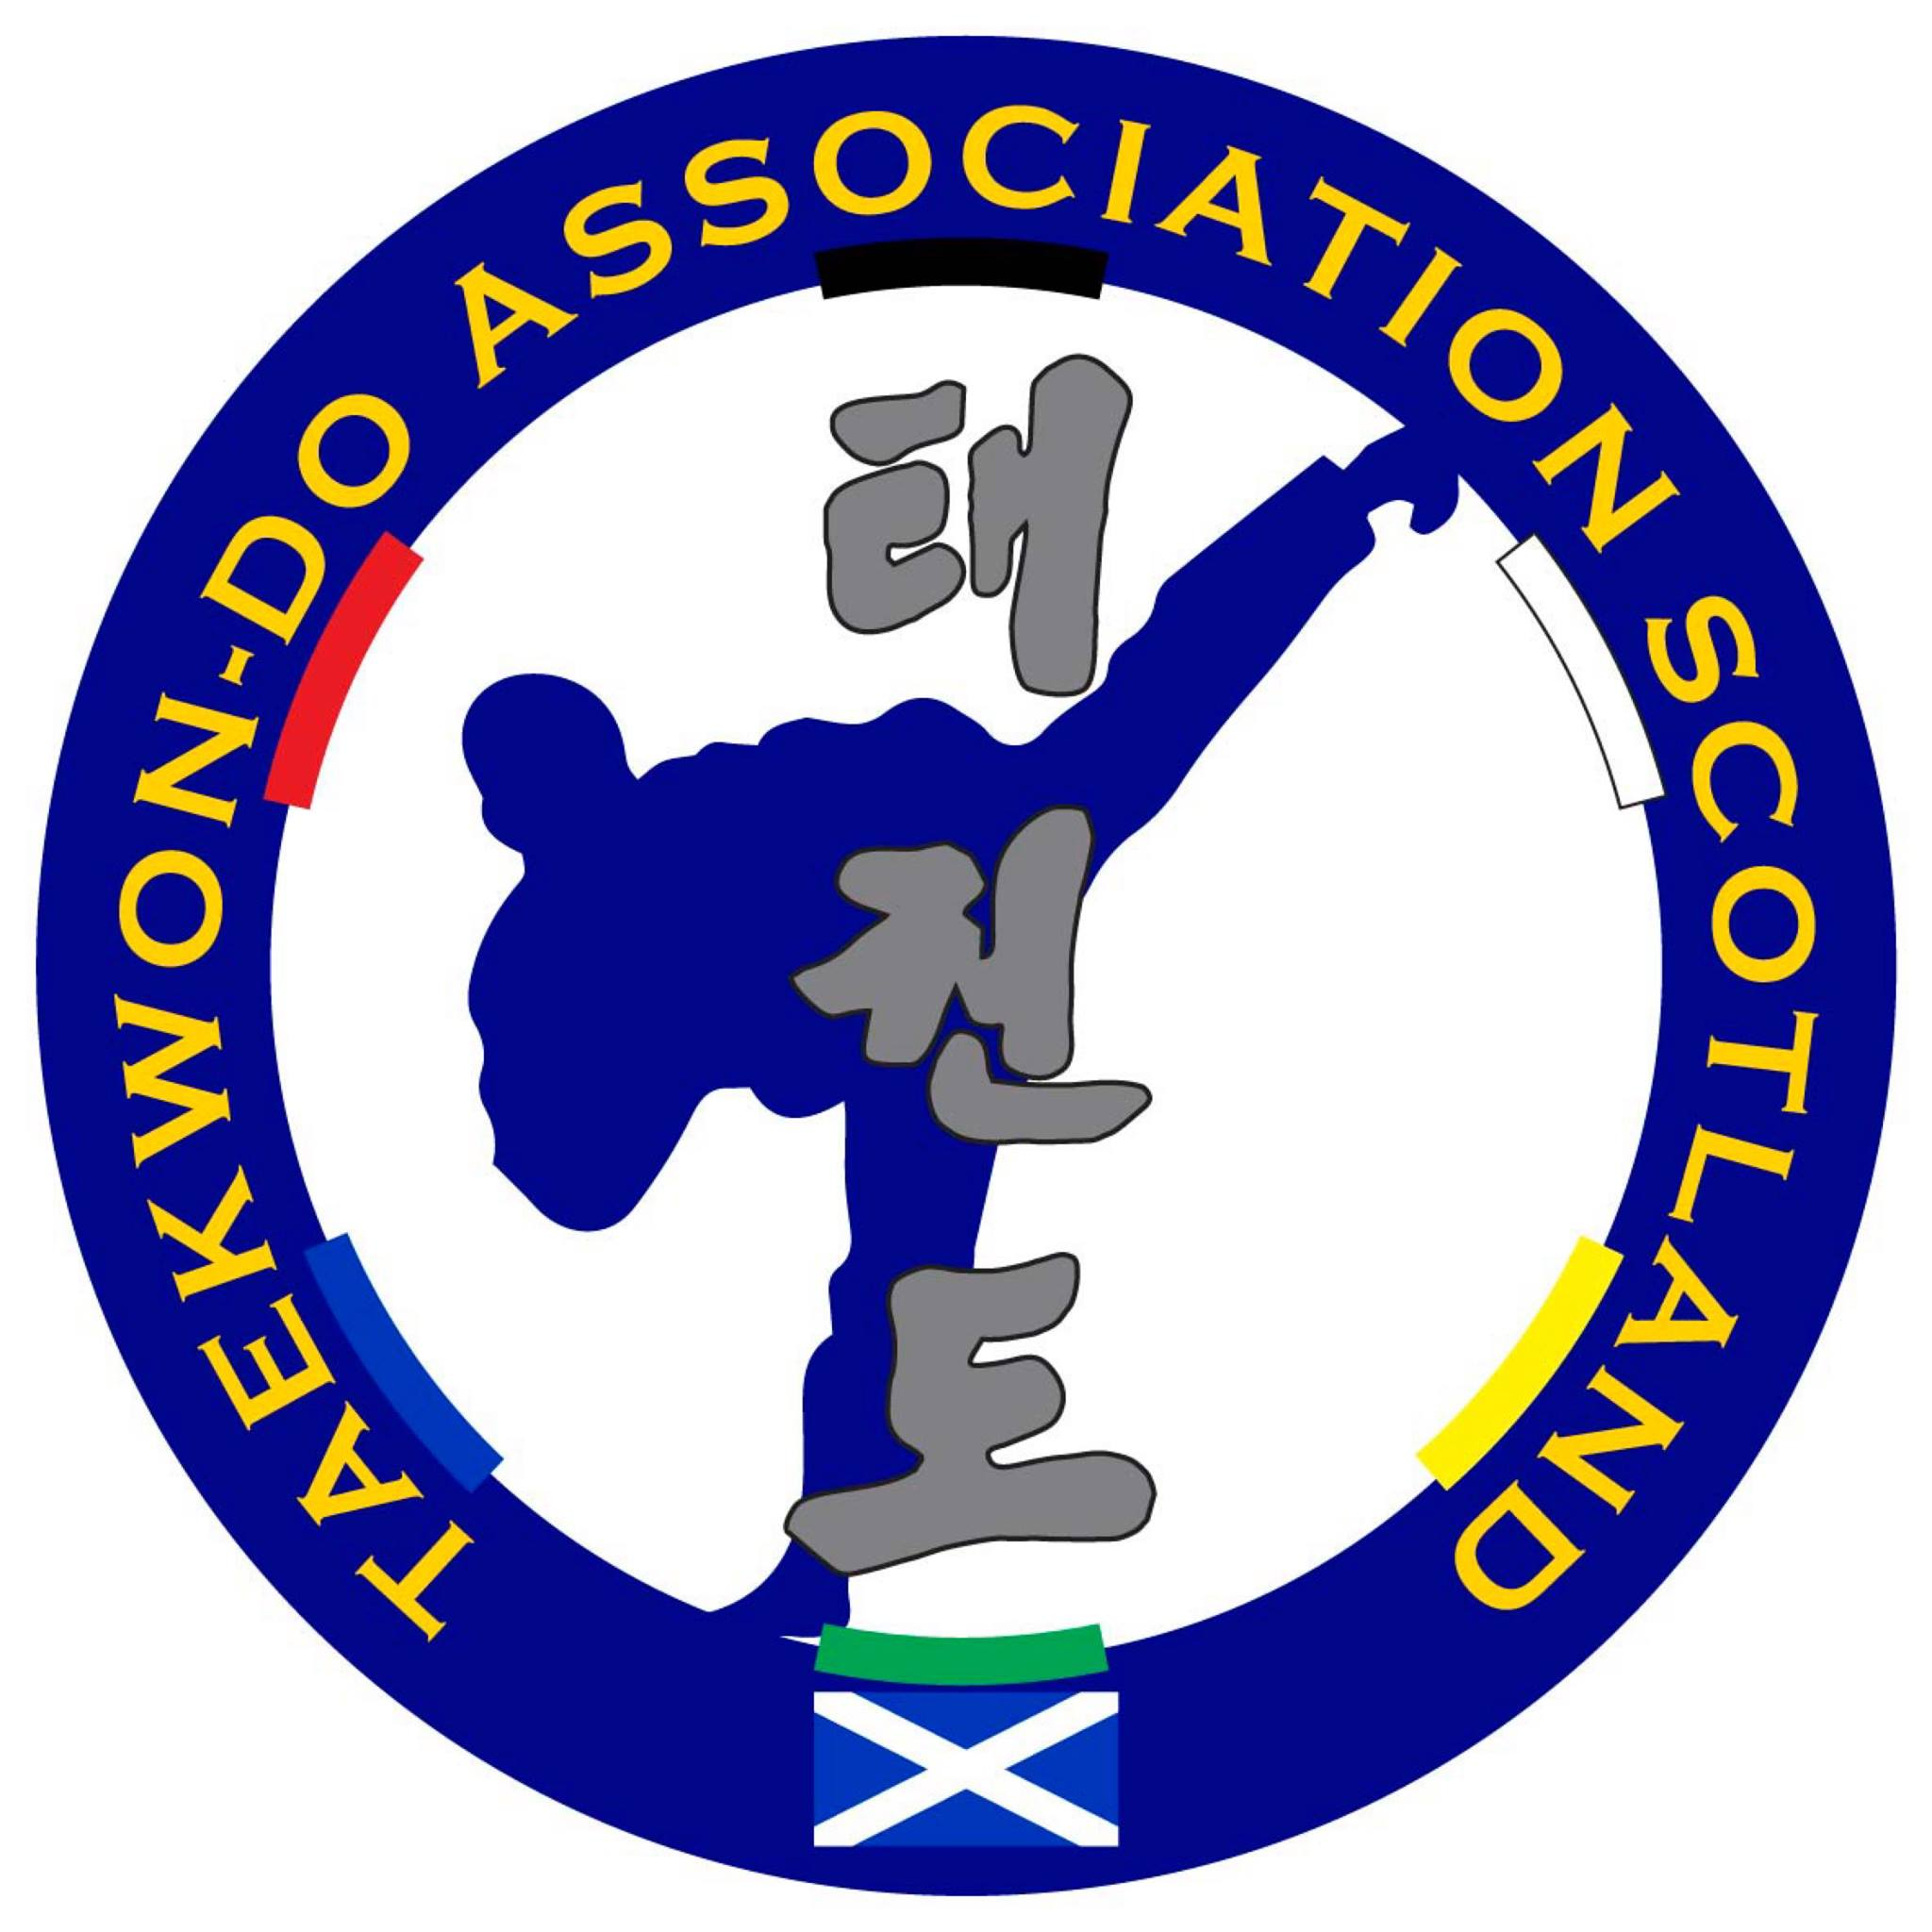 Taekwondo Association Scotland